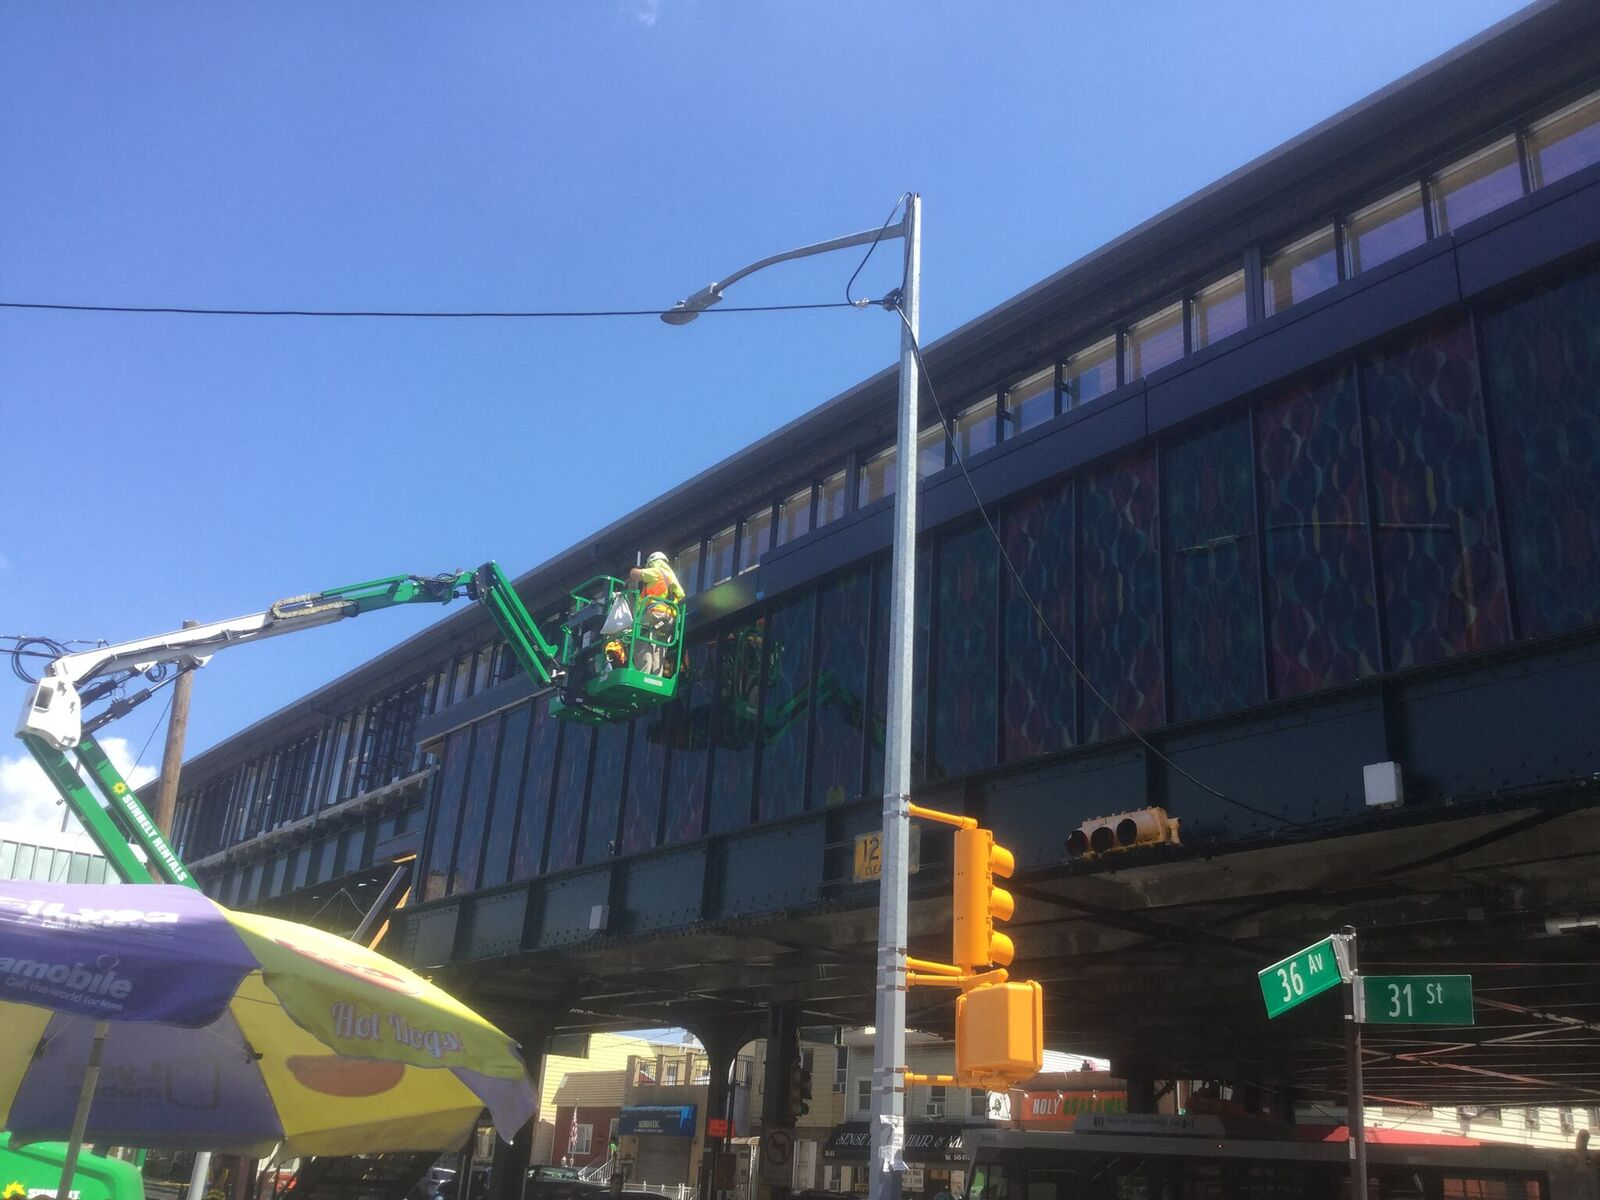 Astoria Queens,NY